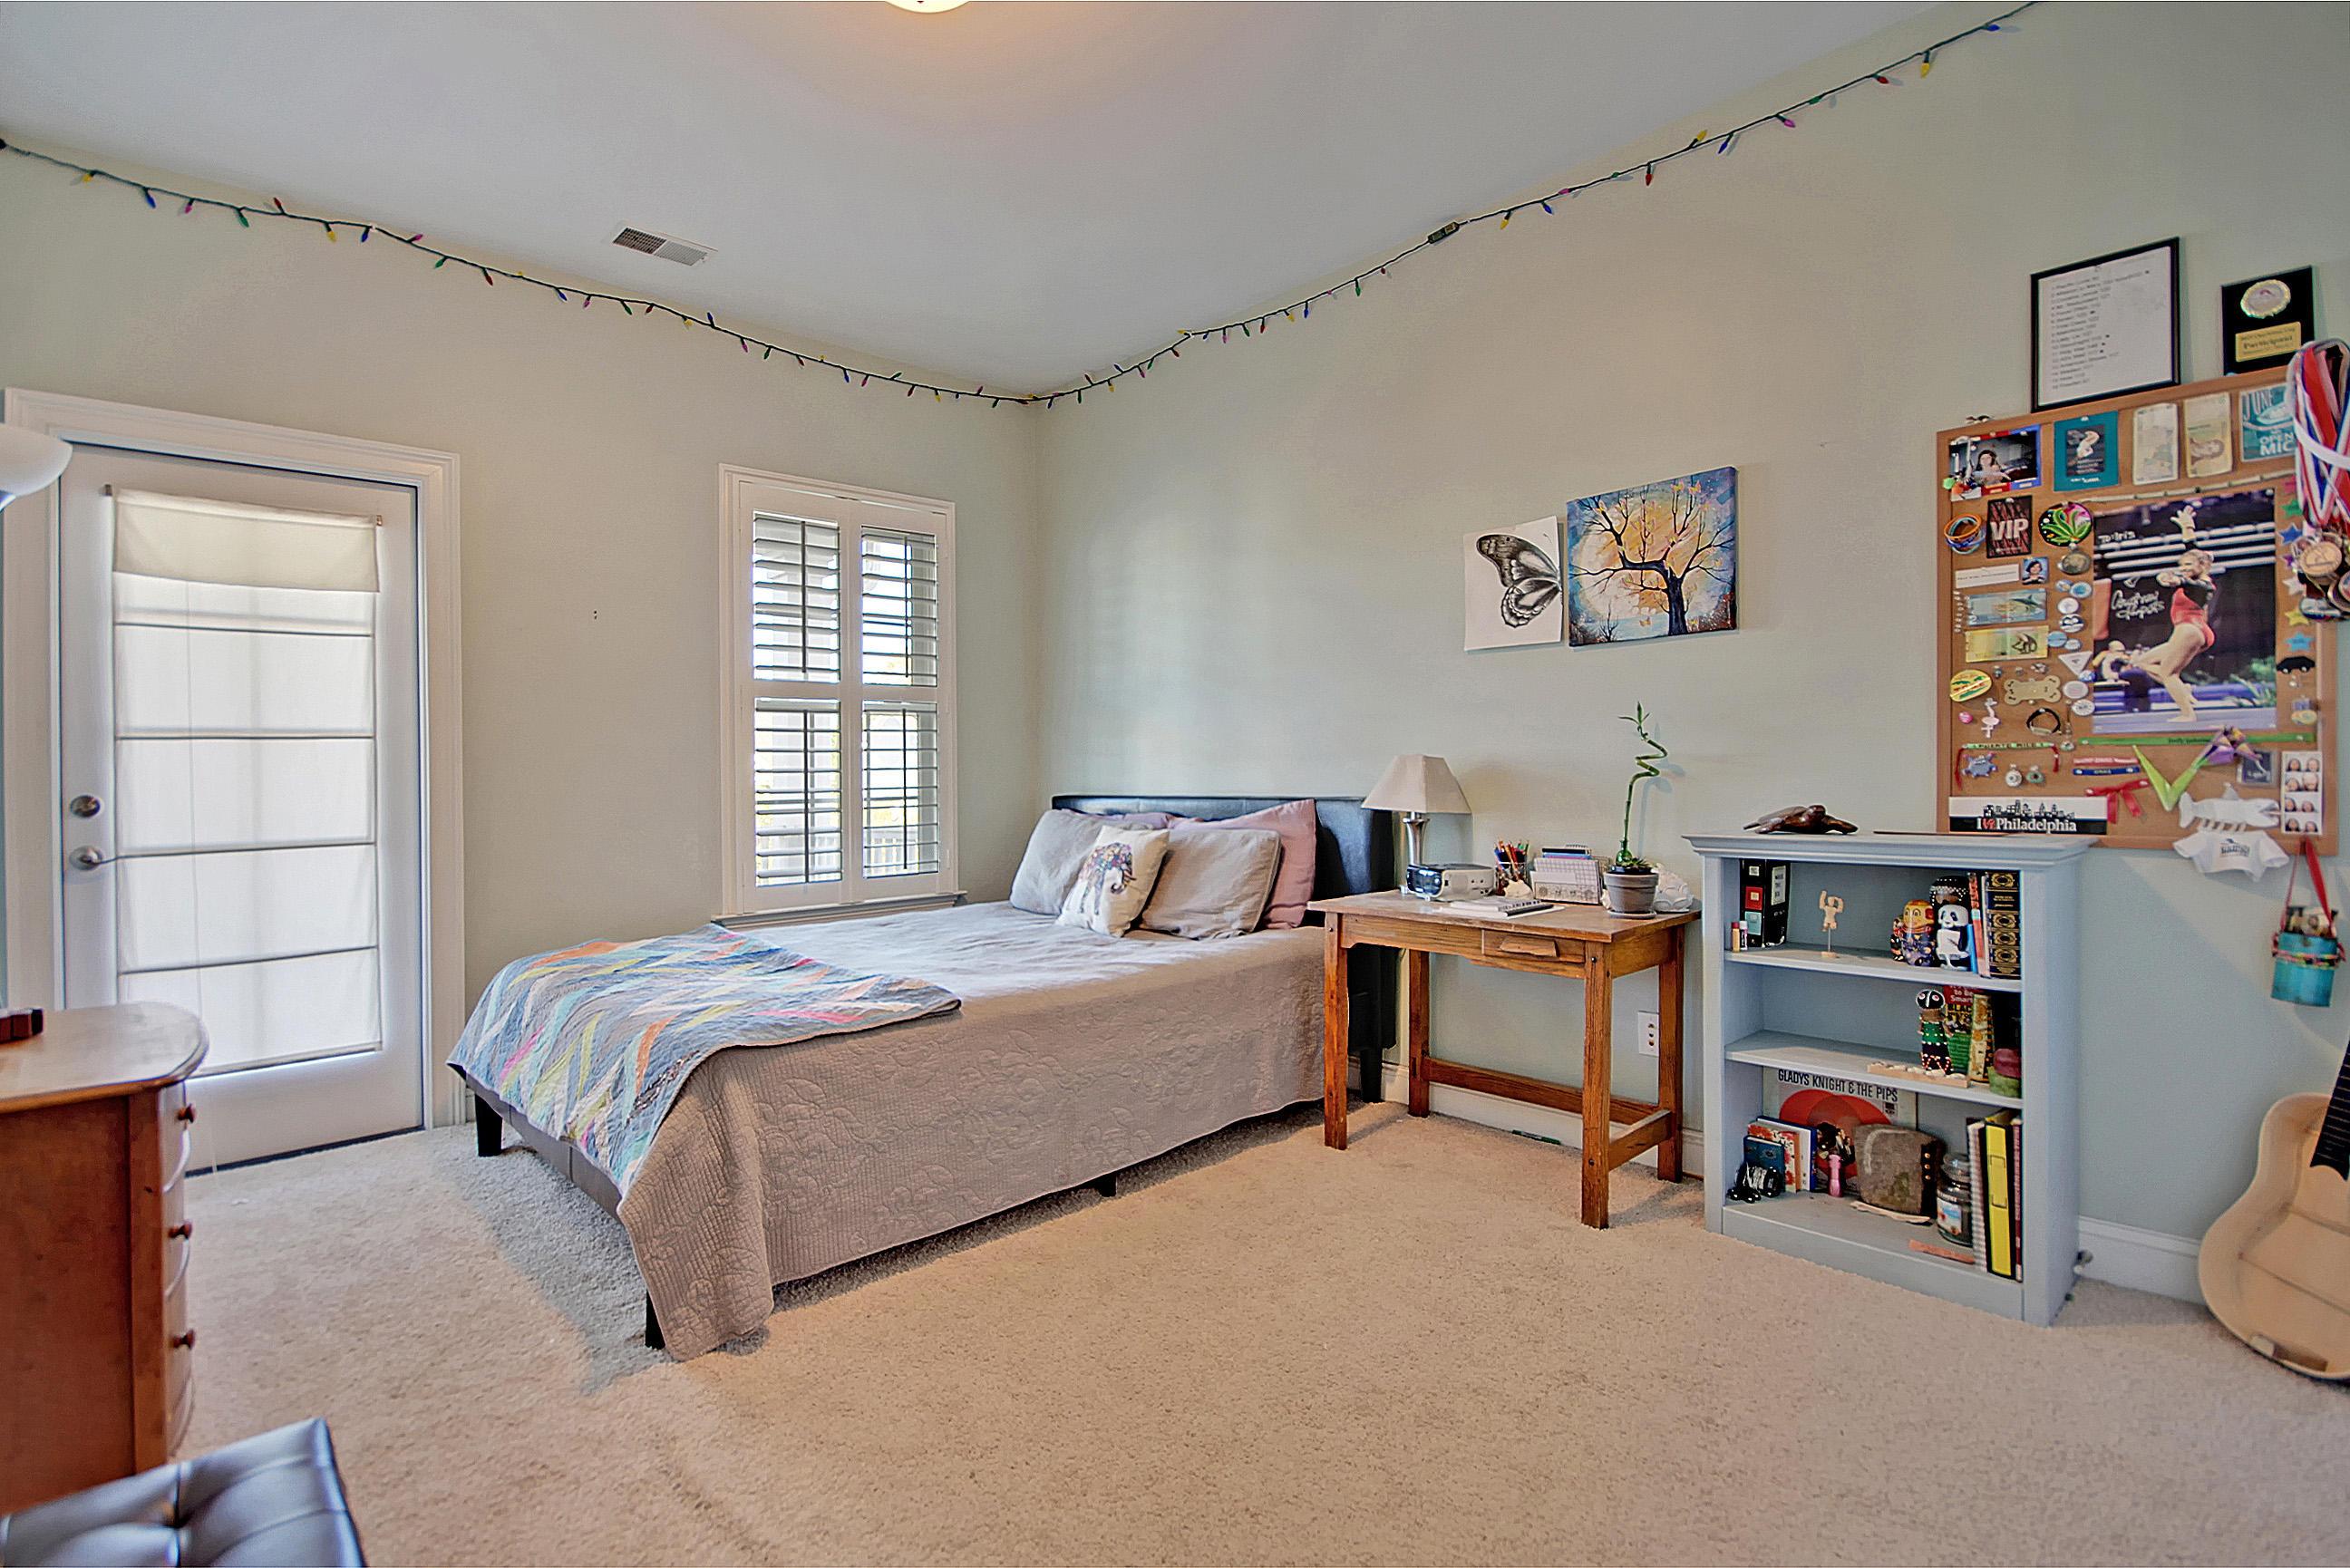 Cloudbreak Court Homes For Sale - 638 Cloudbreak, Charleston, SC - 3